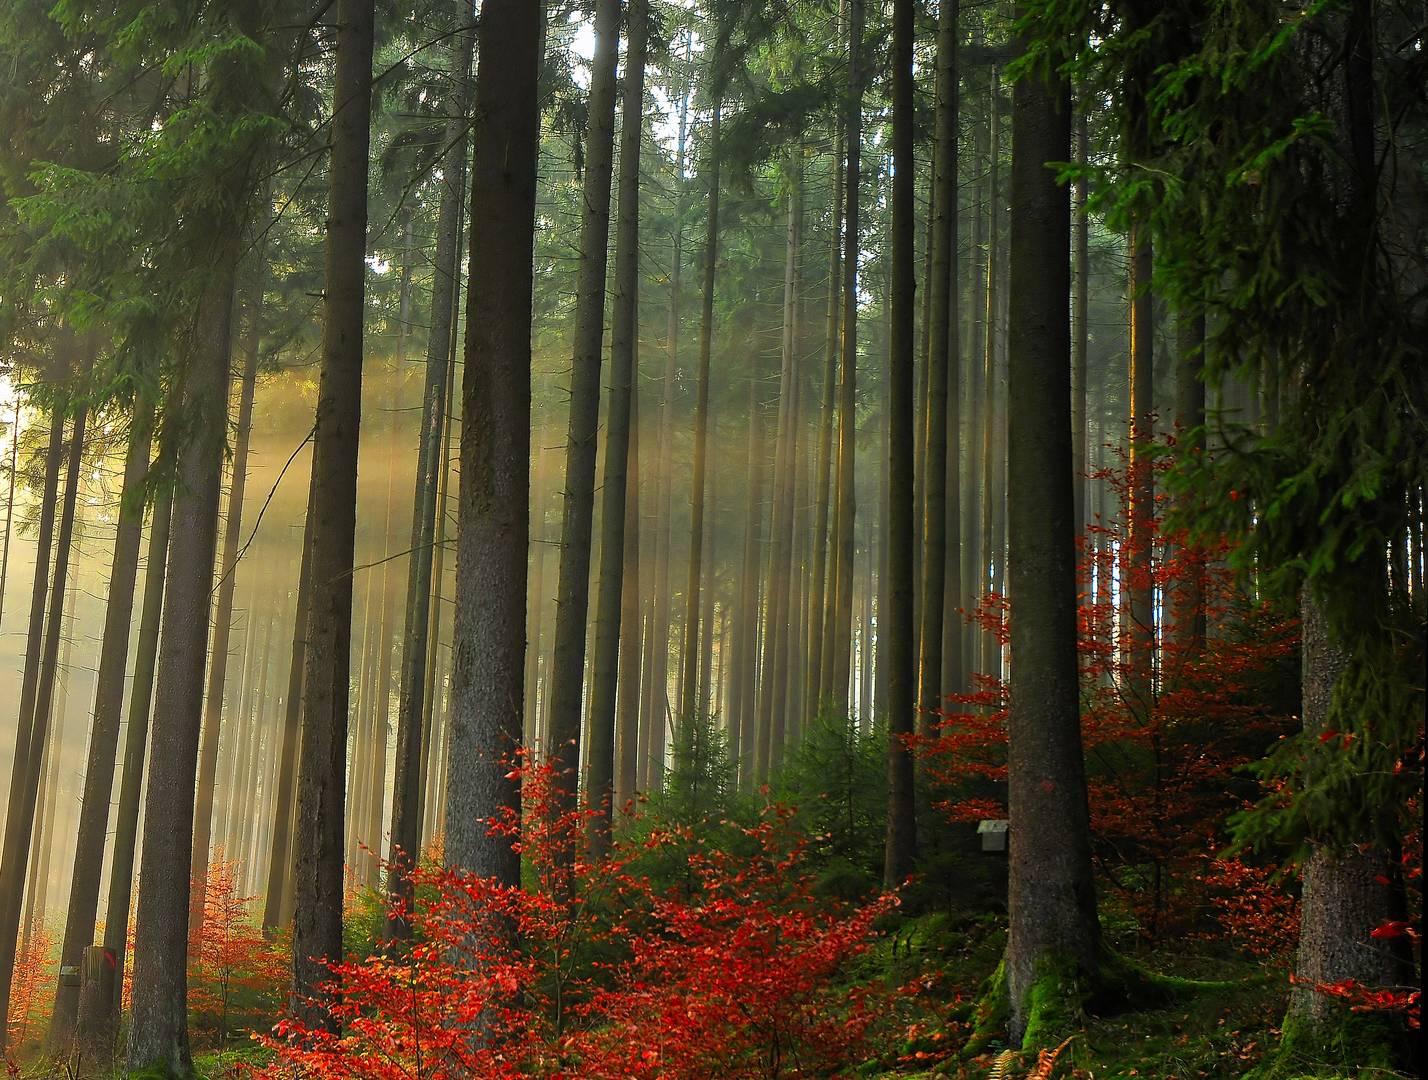 Zauberhafter Wald